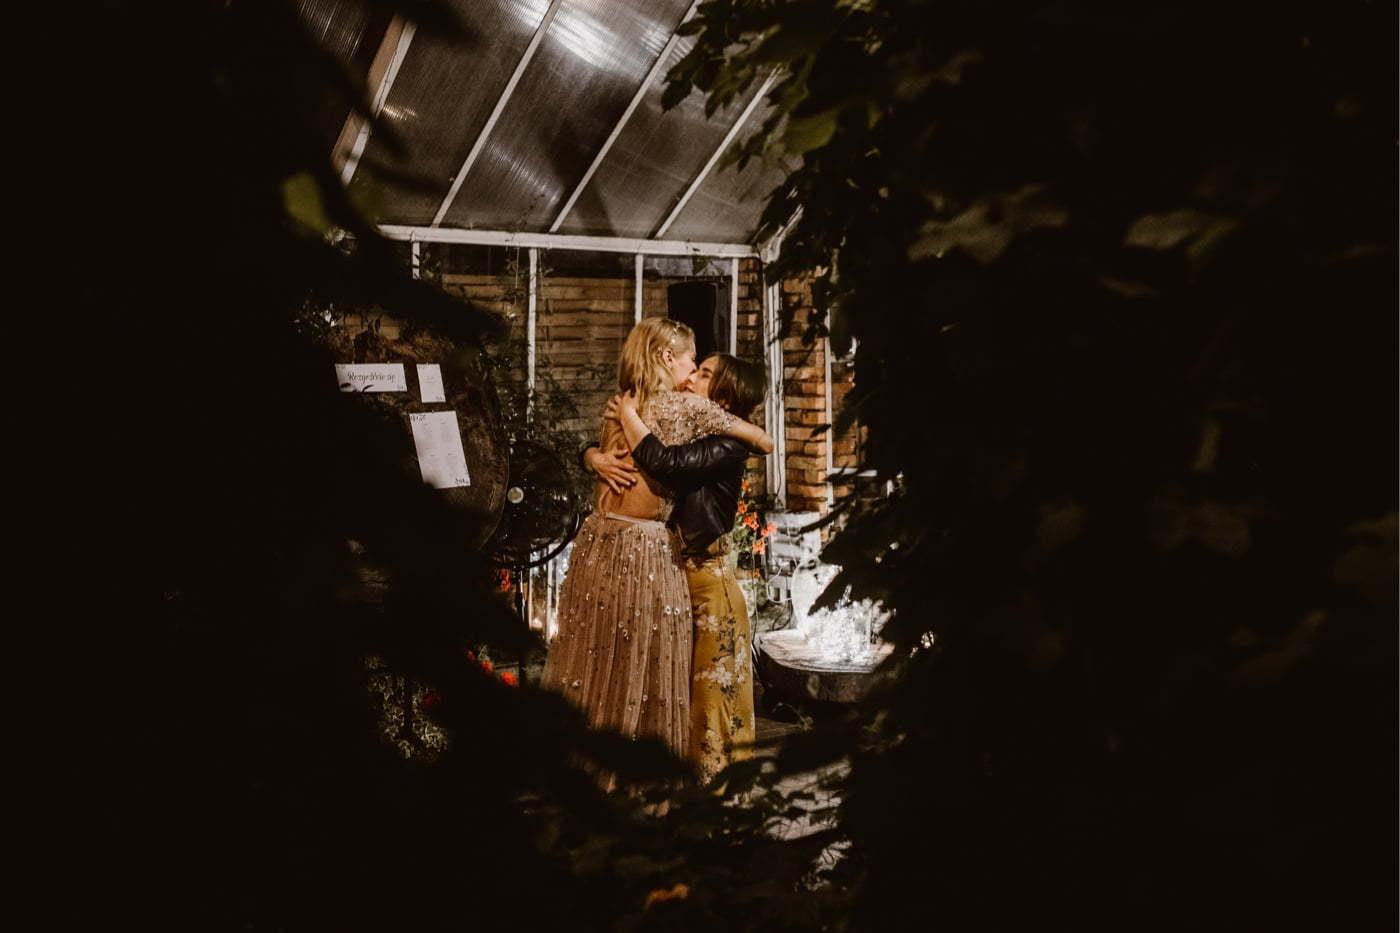 ewelina zieba rustykalne wesele stara oranzeria warszawa 099